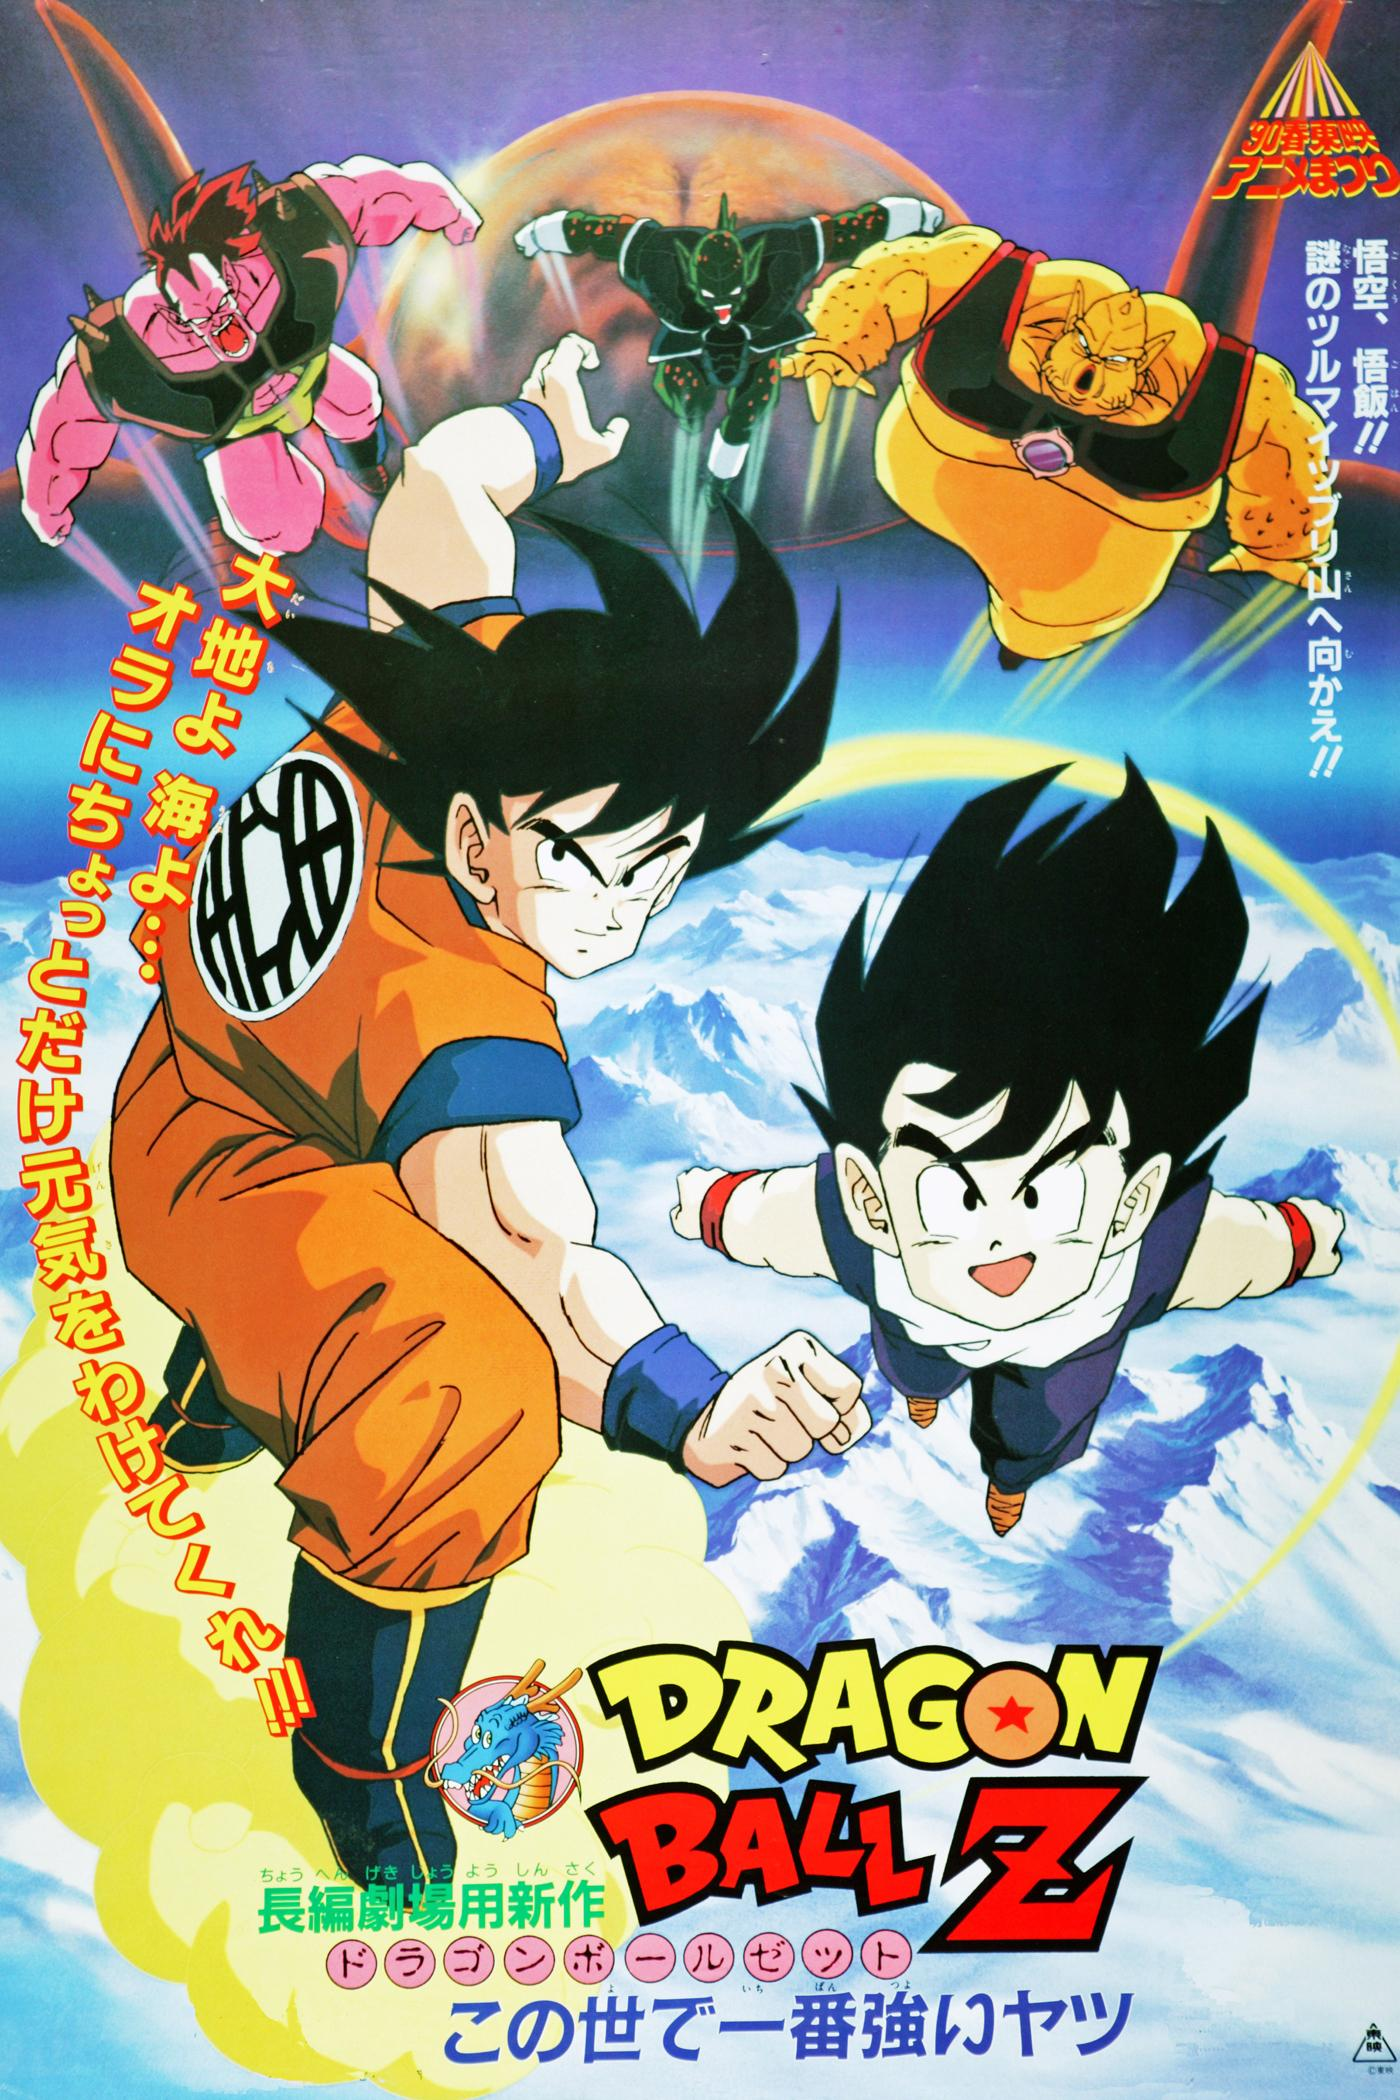 Dragon Ball Z The Worlds Strongest 1990 Imdb